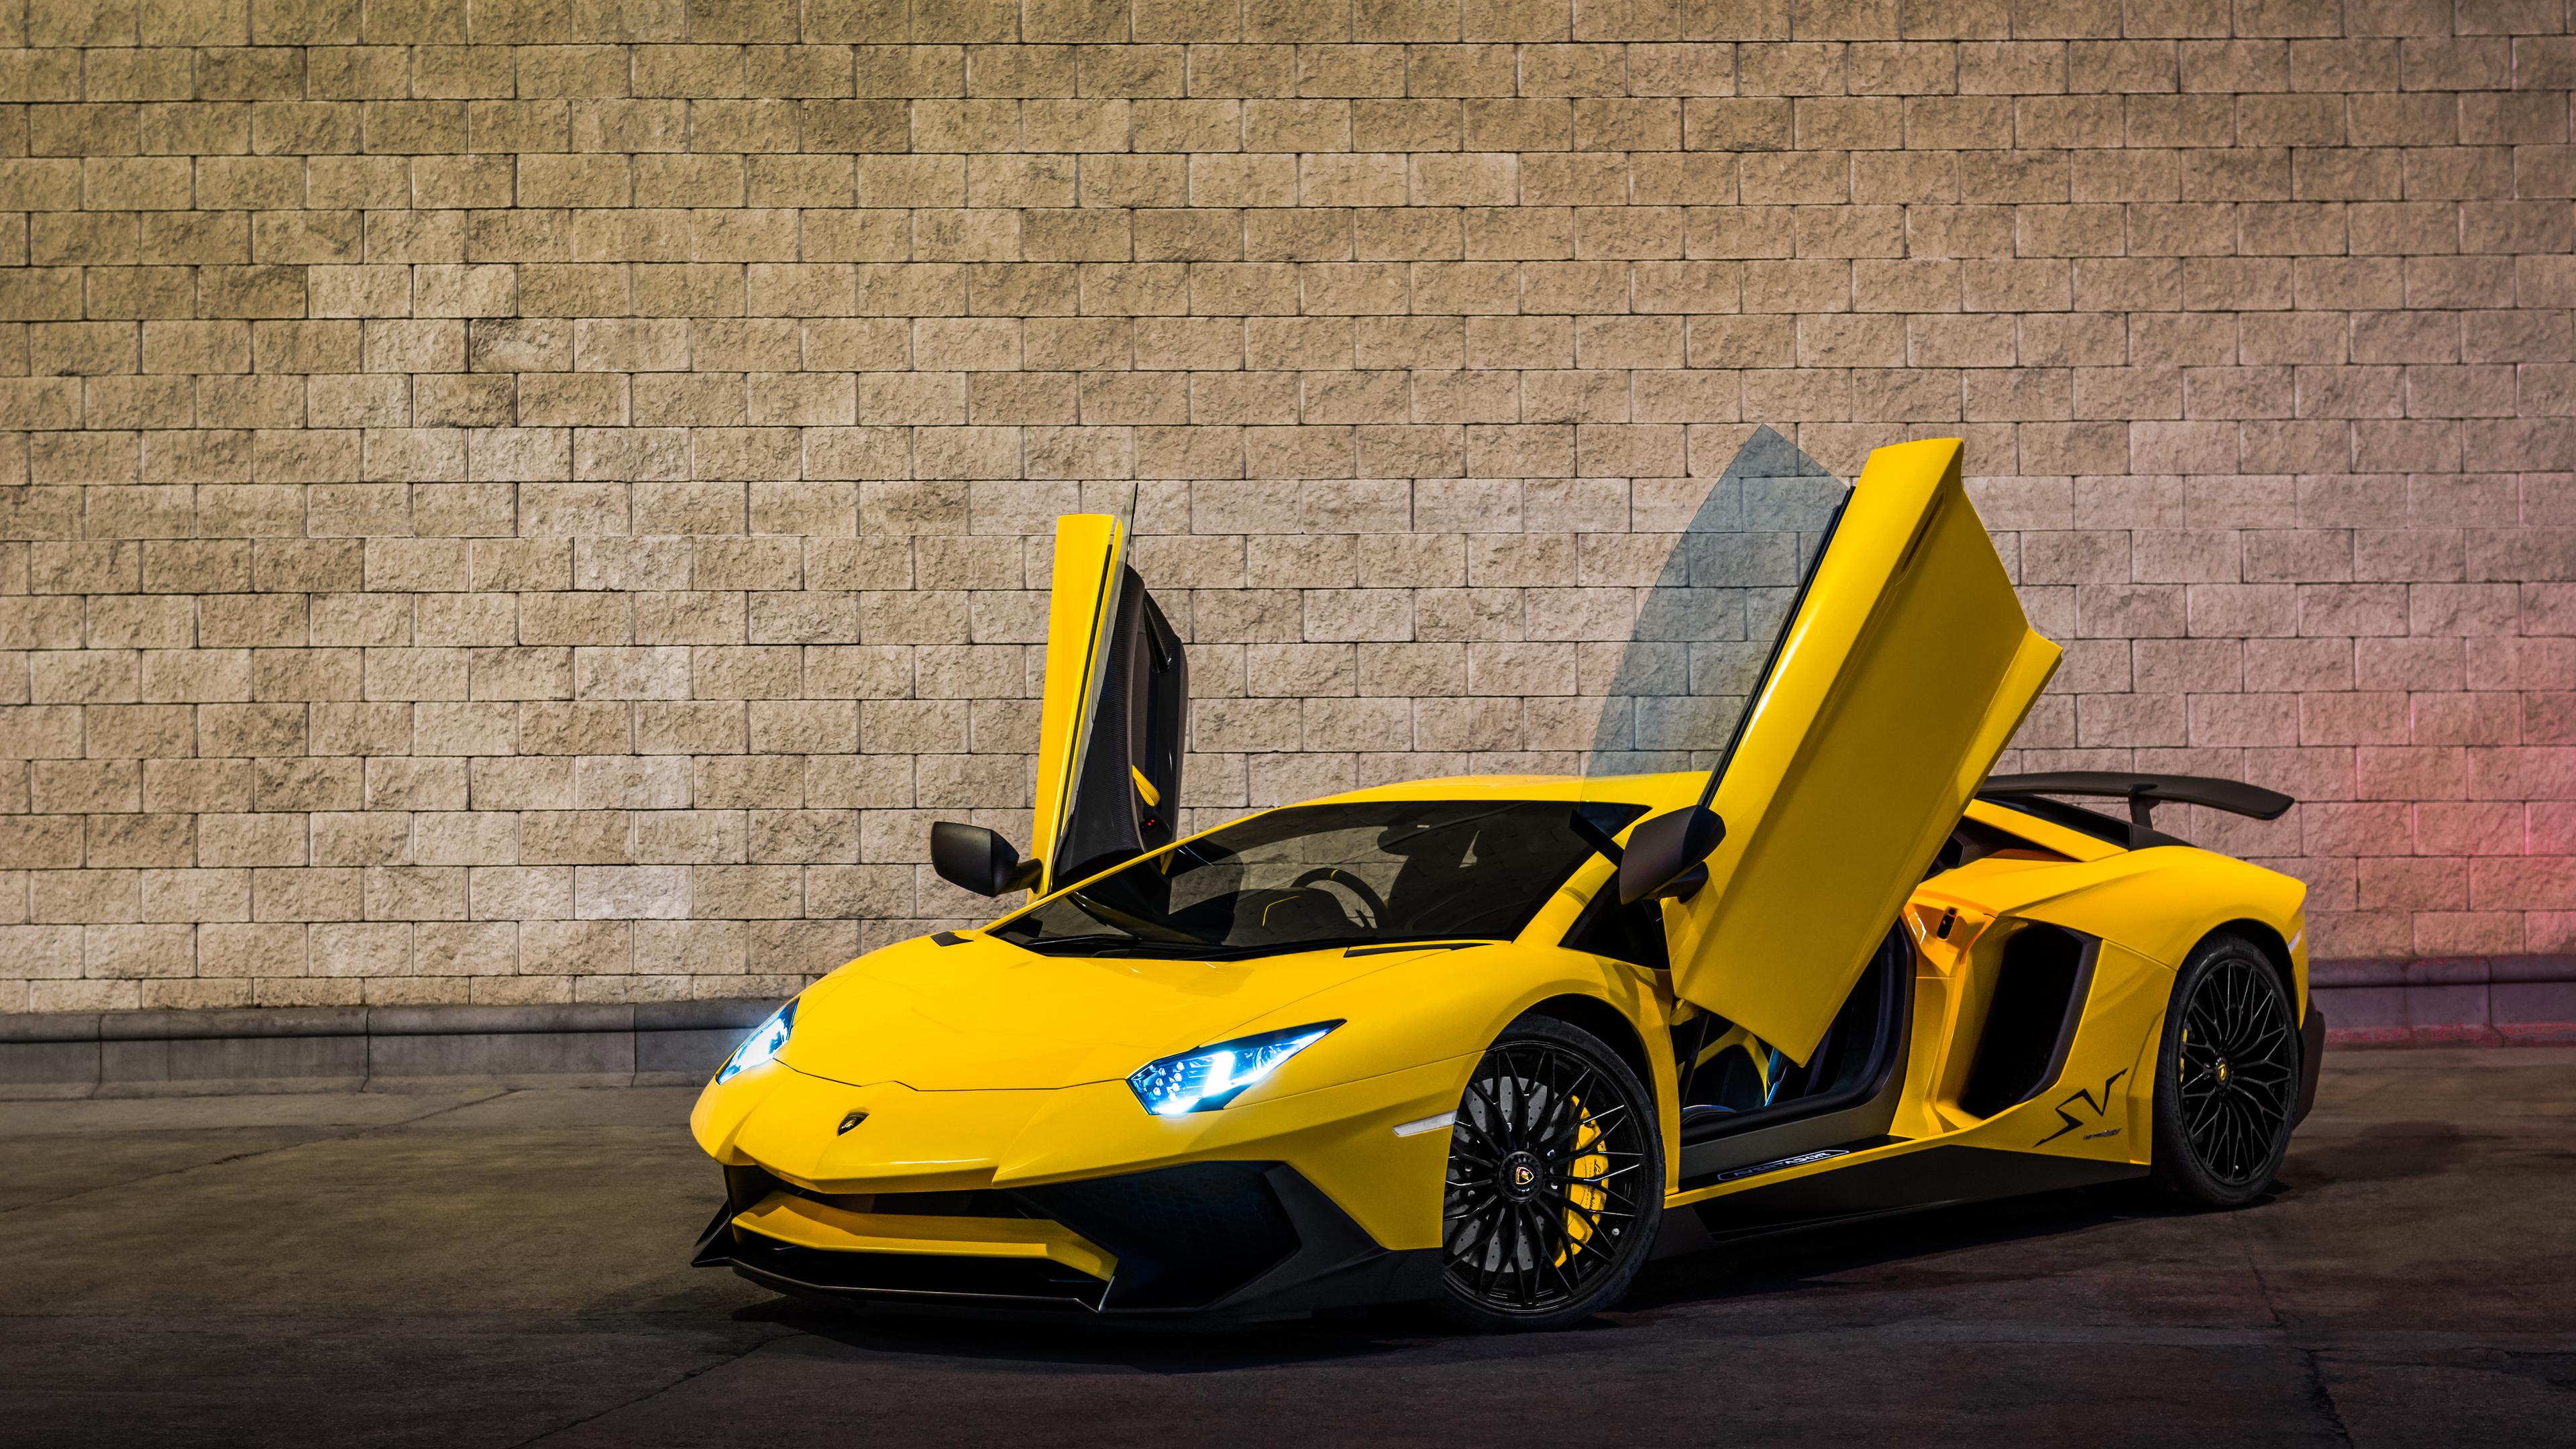 Wallpaper 4k Yellow Lamborghini Aventador 2019 4k 4k